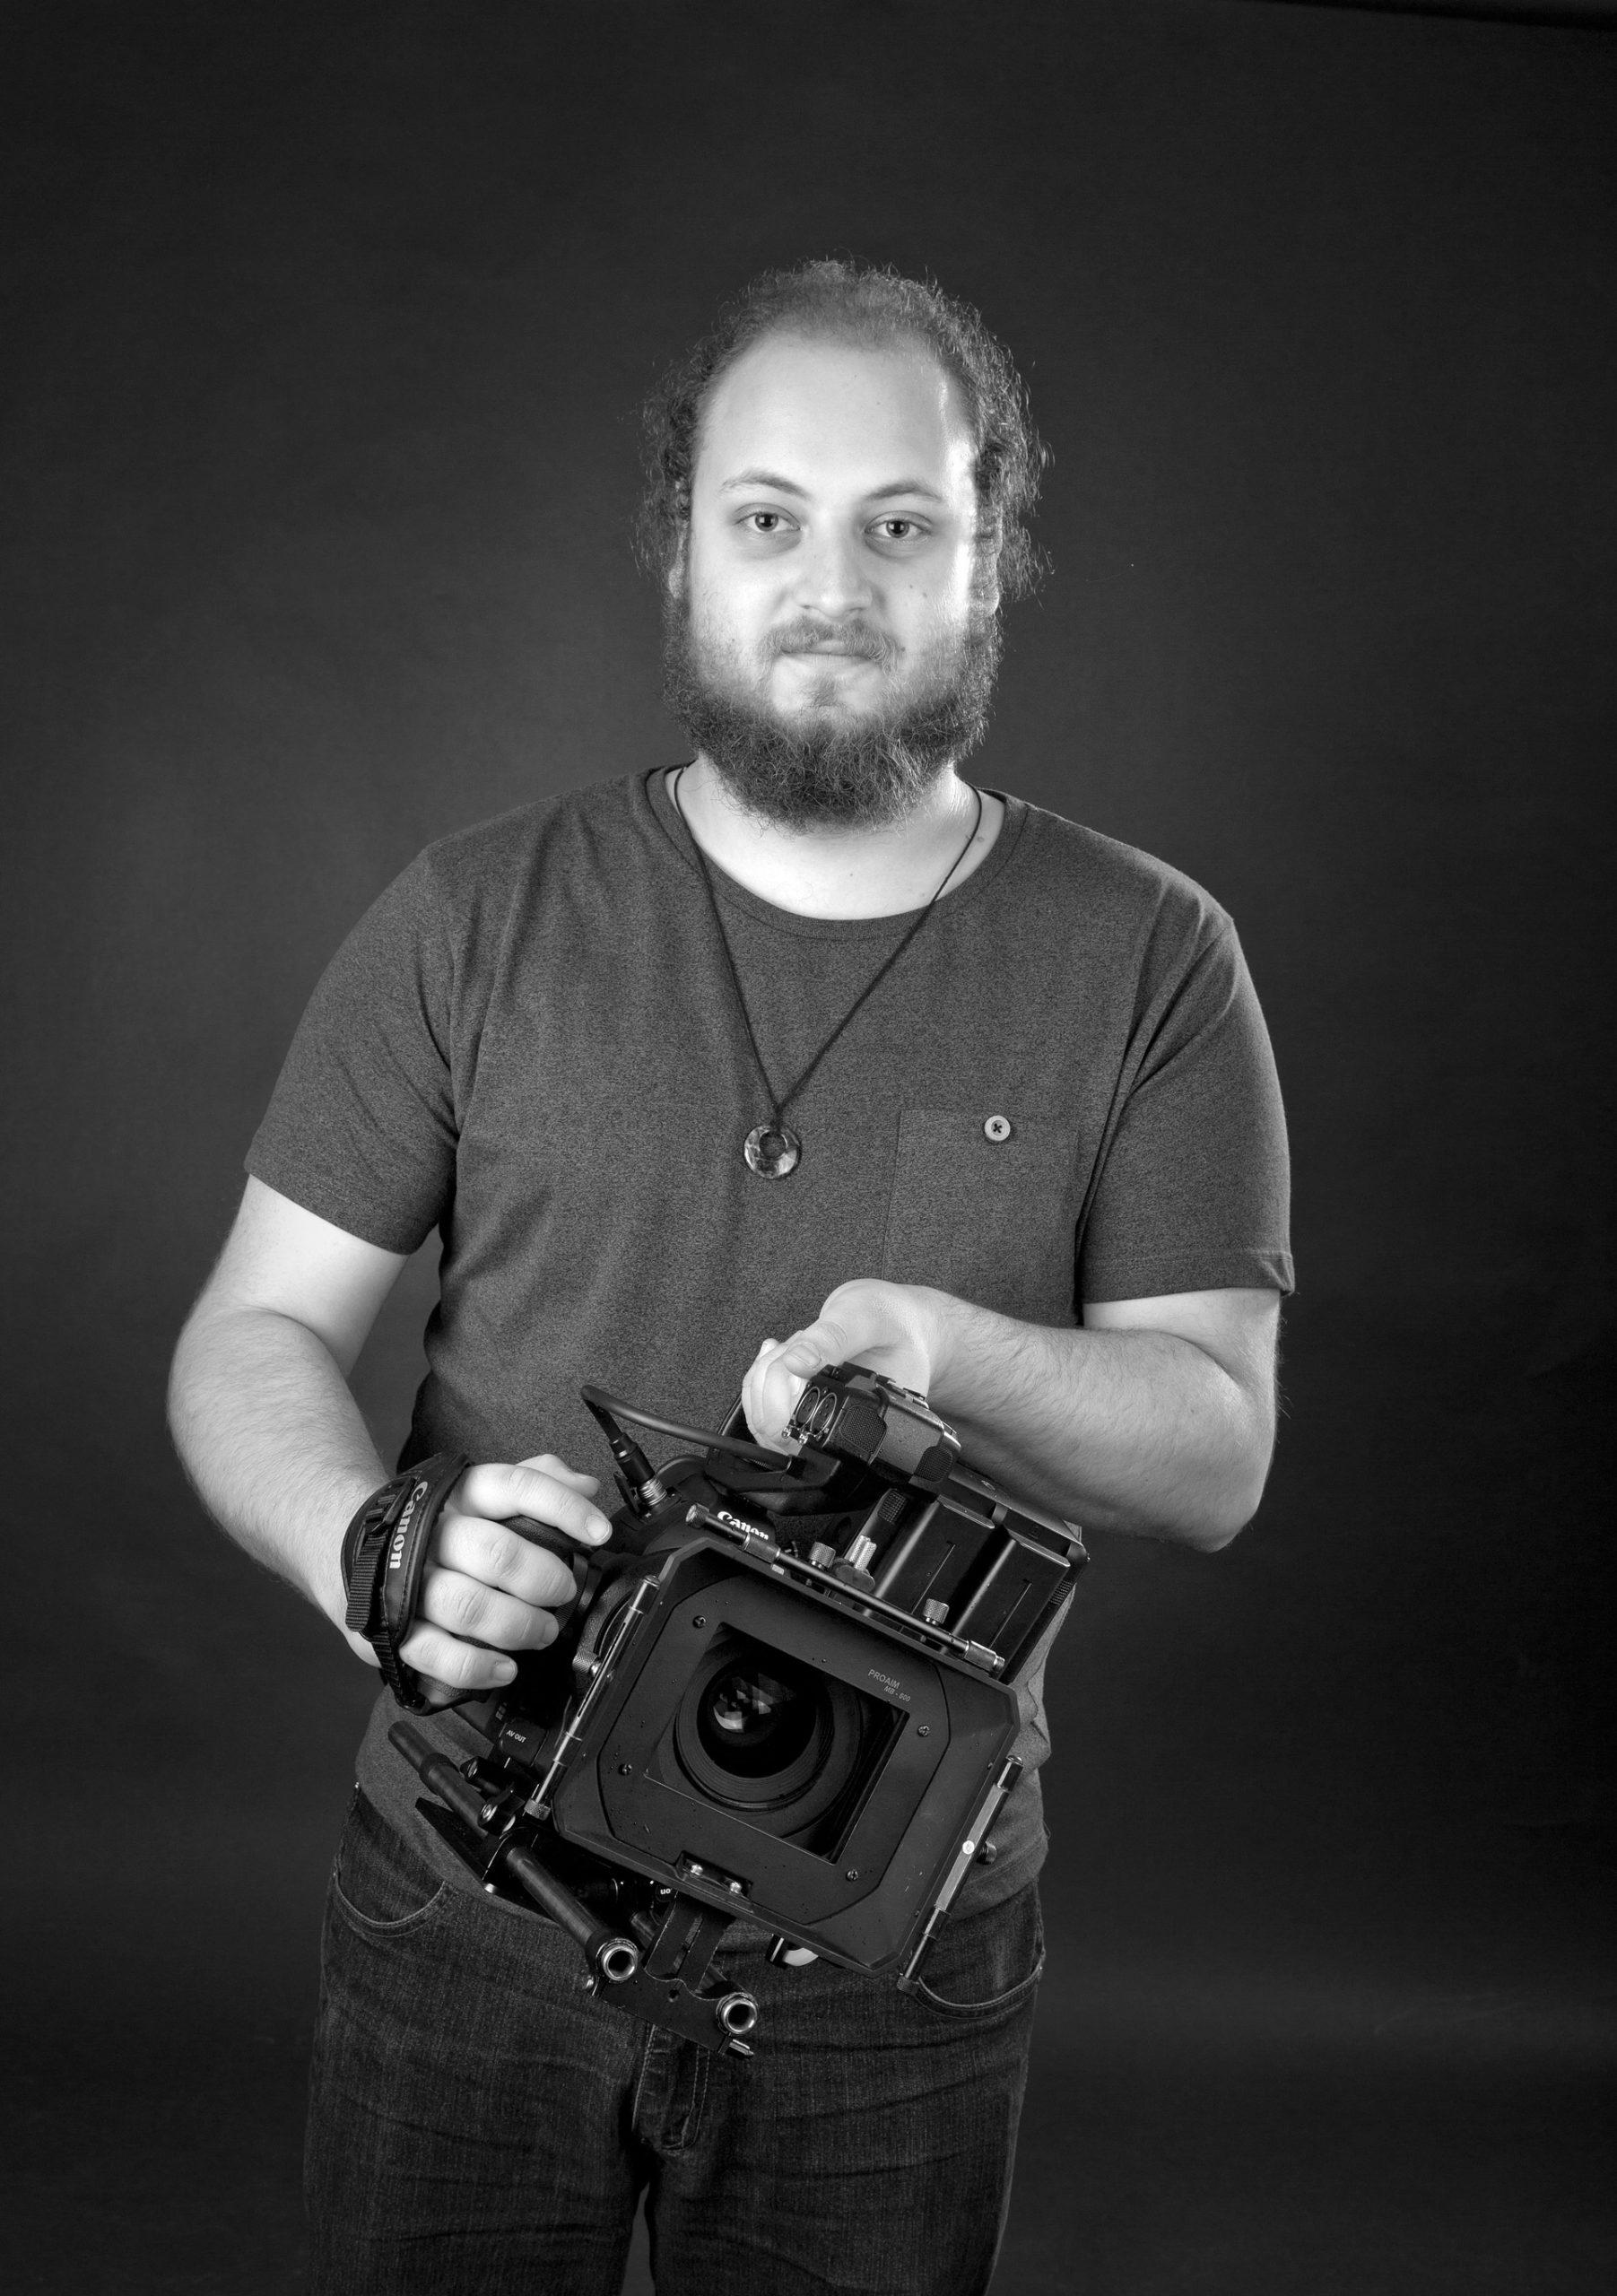 A man holding a video camera